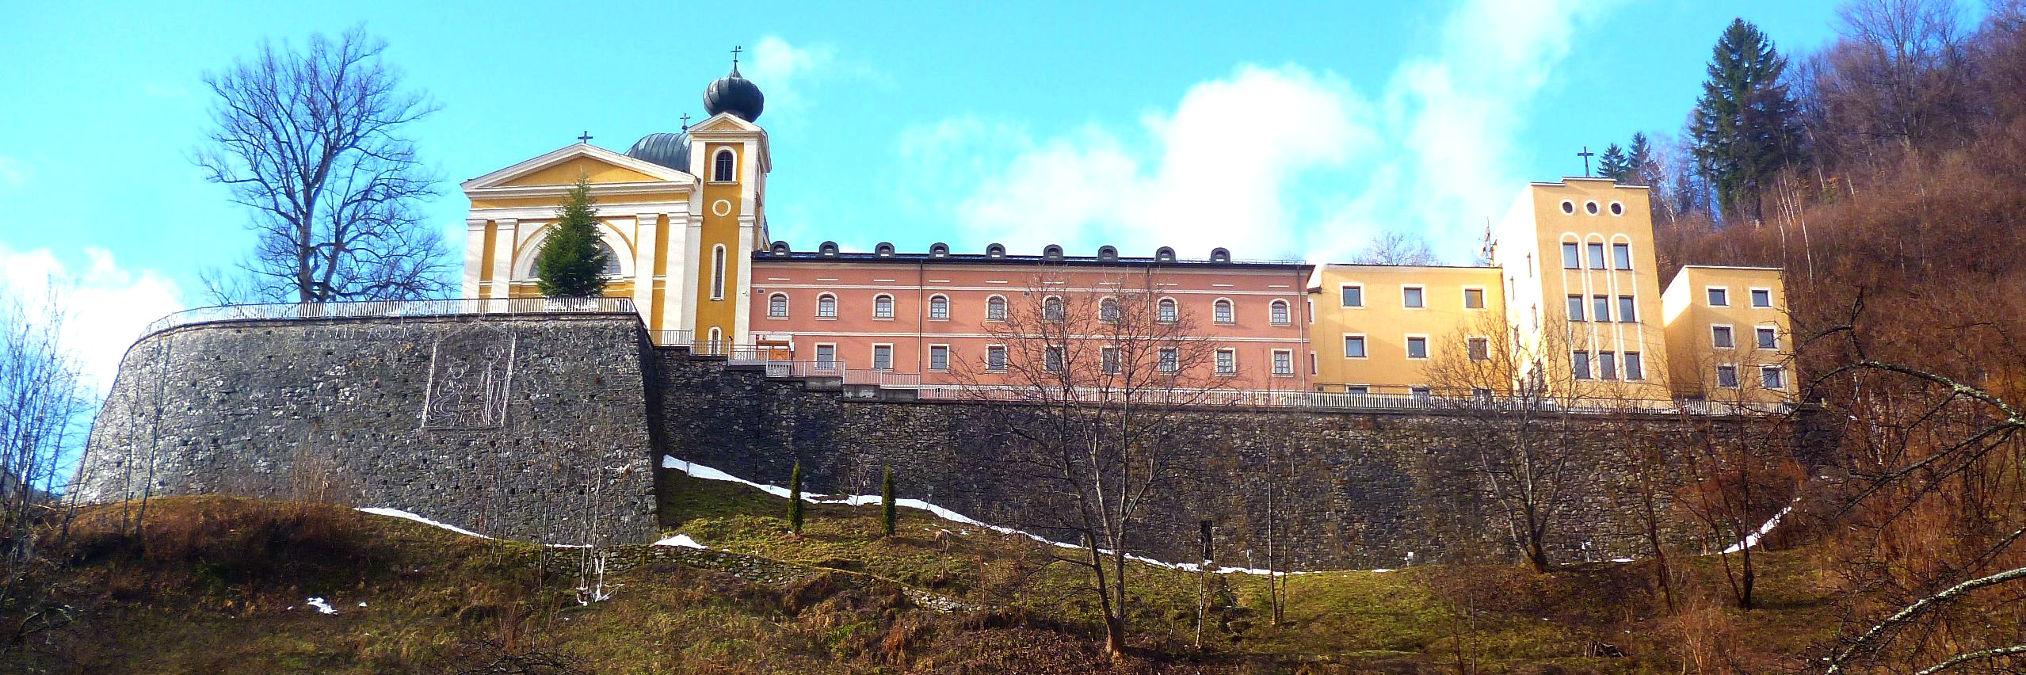 Монастырь Святого Духа в Фойнице. Фото: Елена Арсениевич, CC BY-SA 3.0